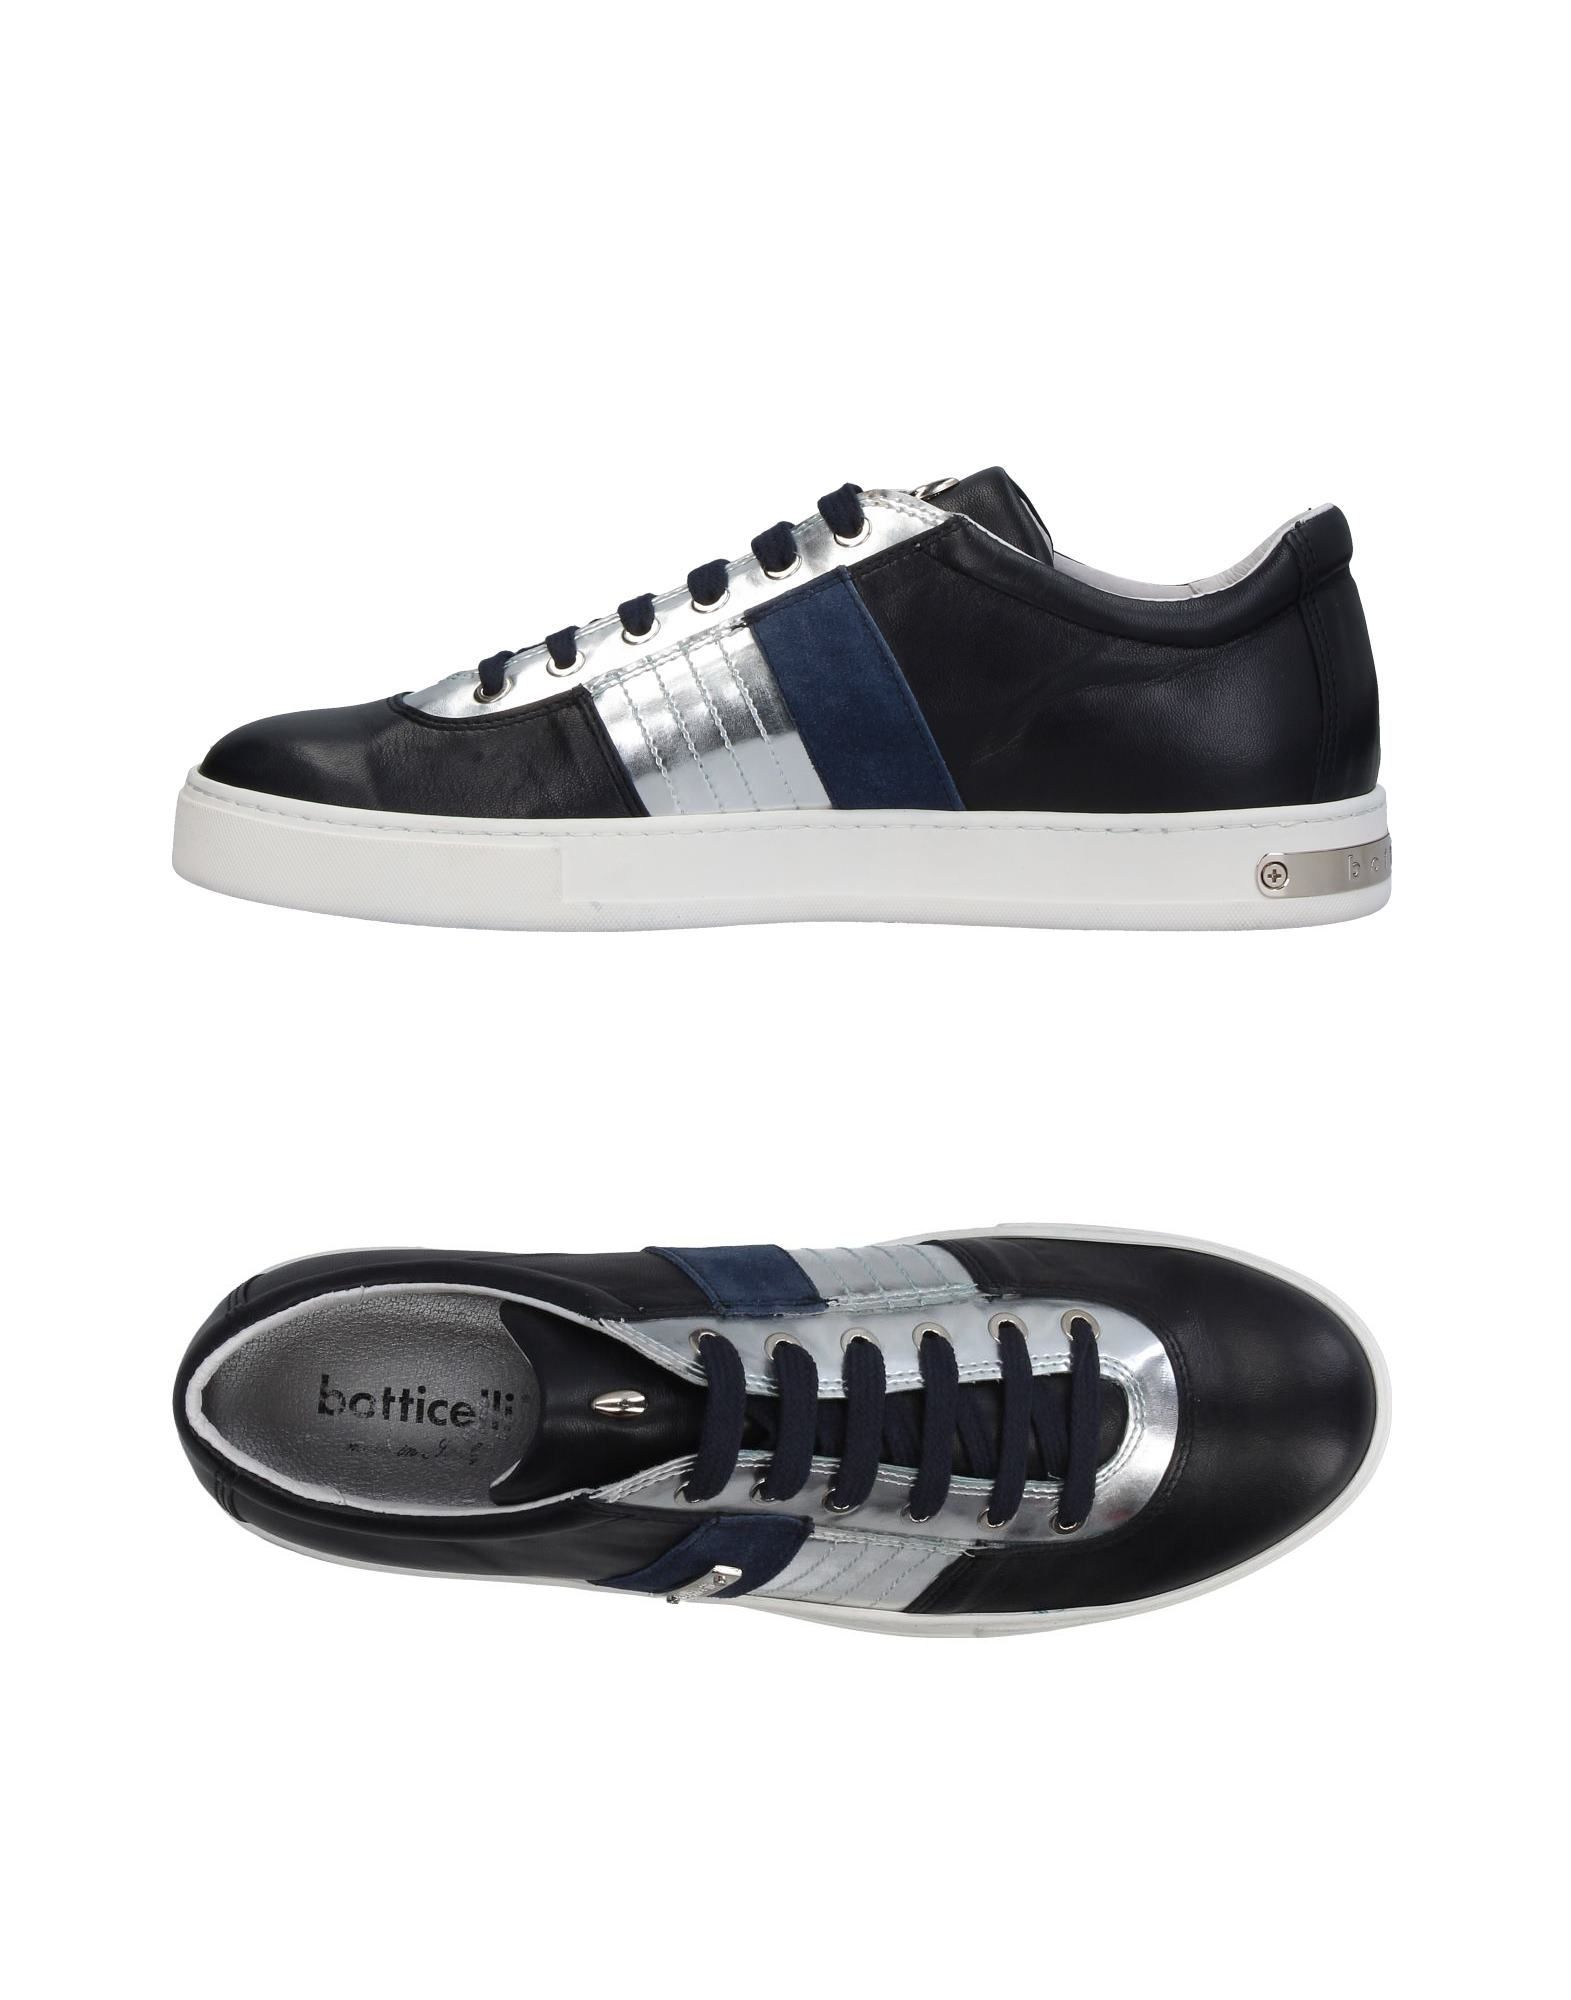 Sneakers Botticelli Homme - Sneakers Botticelli sur